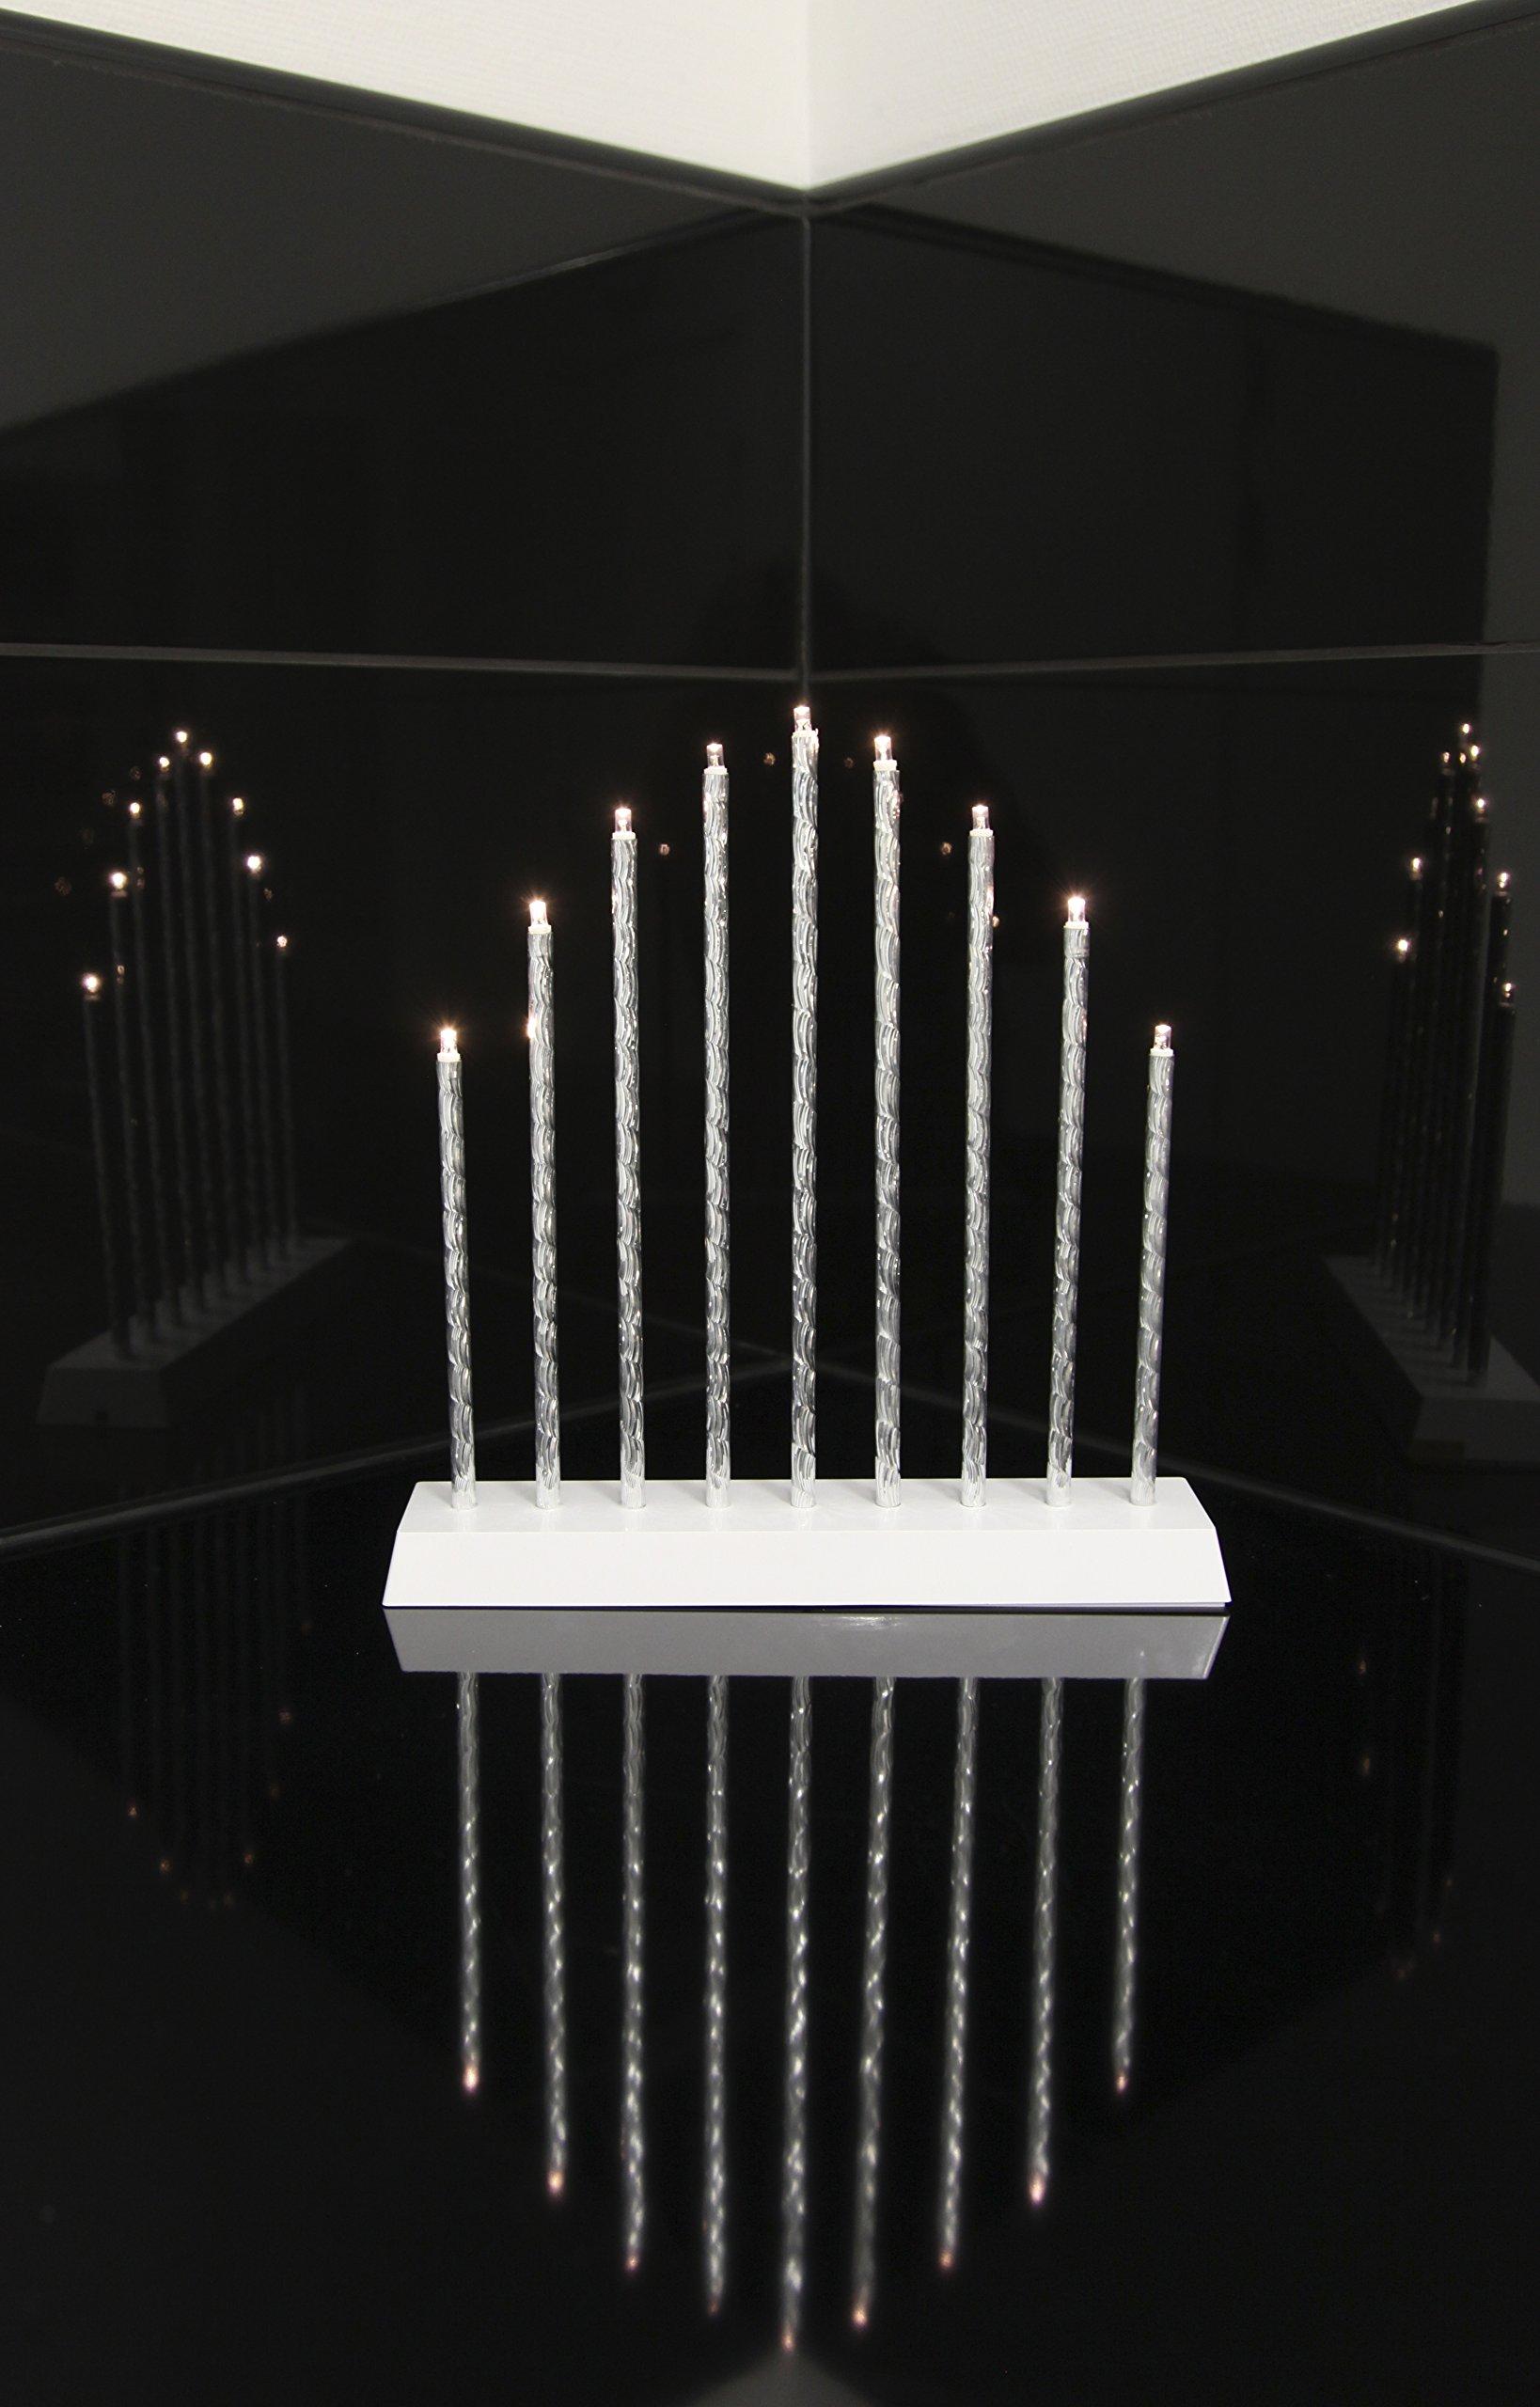 Star-LED-FensterleuchterTrix-Battery-Material-Kunststoff-9-flammig-Timer-Vierfarb-Karton-28-x-26-cm-silber-gedreht-192-80